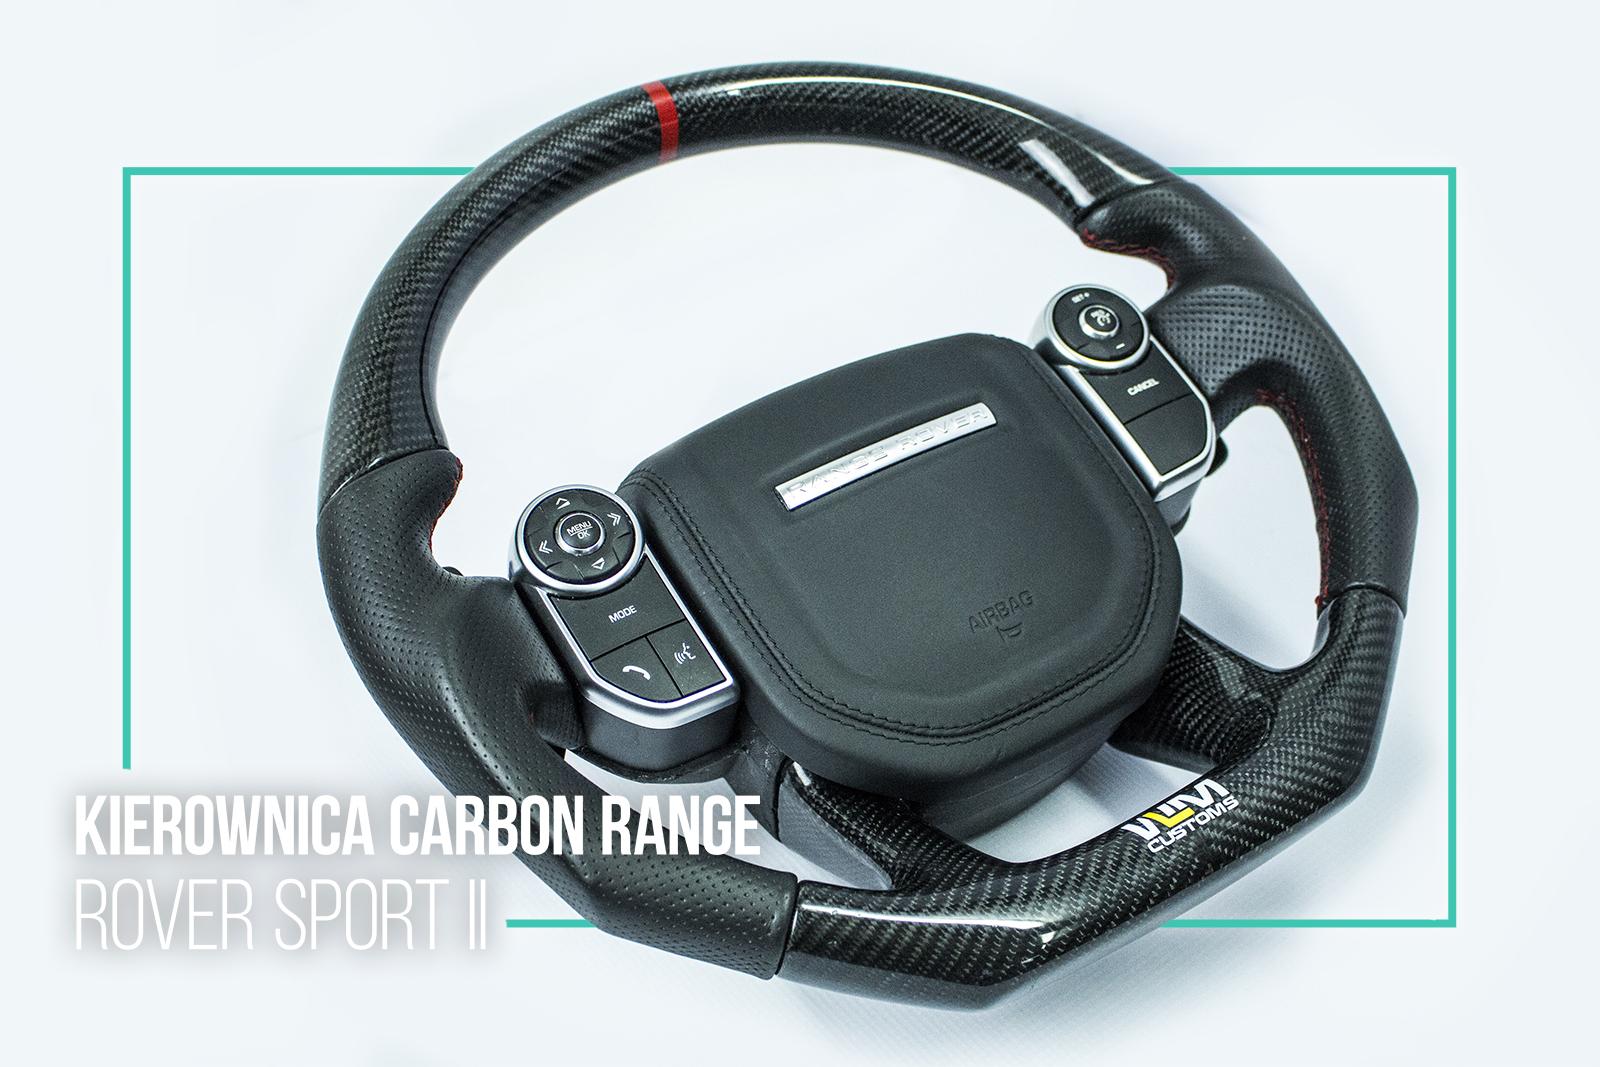 Kierownica Carbon Range Rover Sport II by WLM Customs